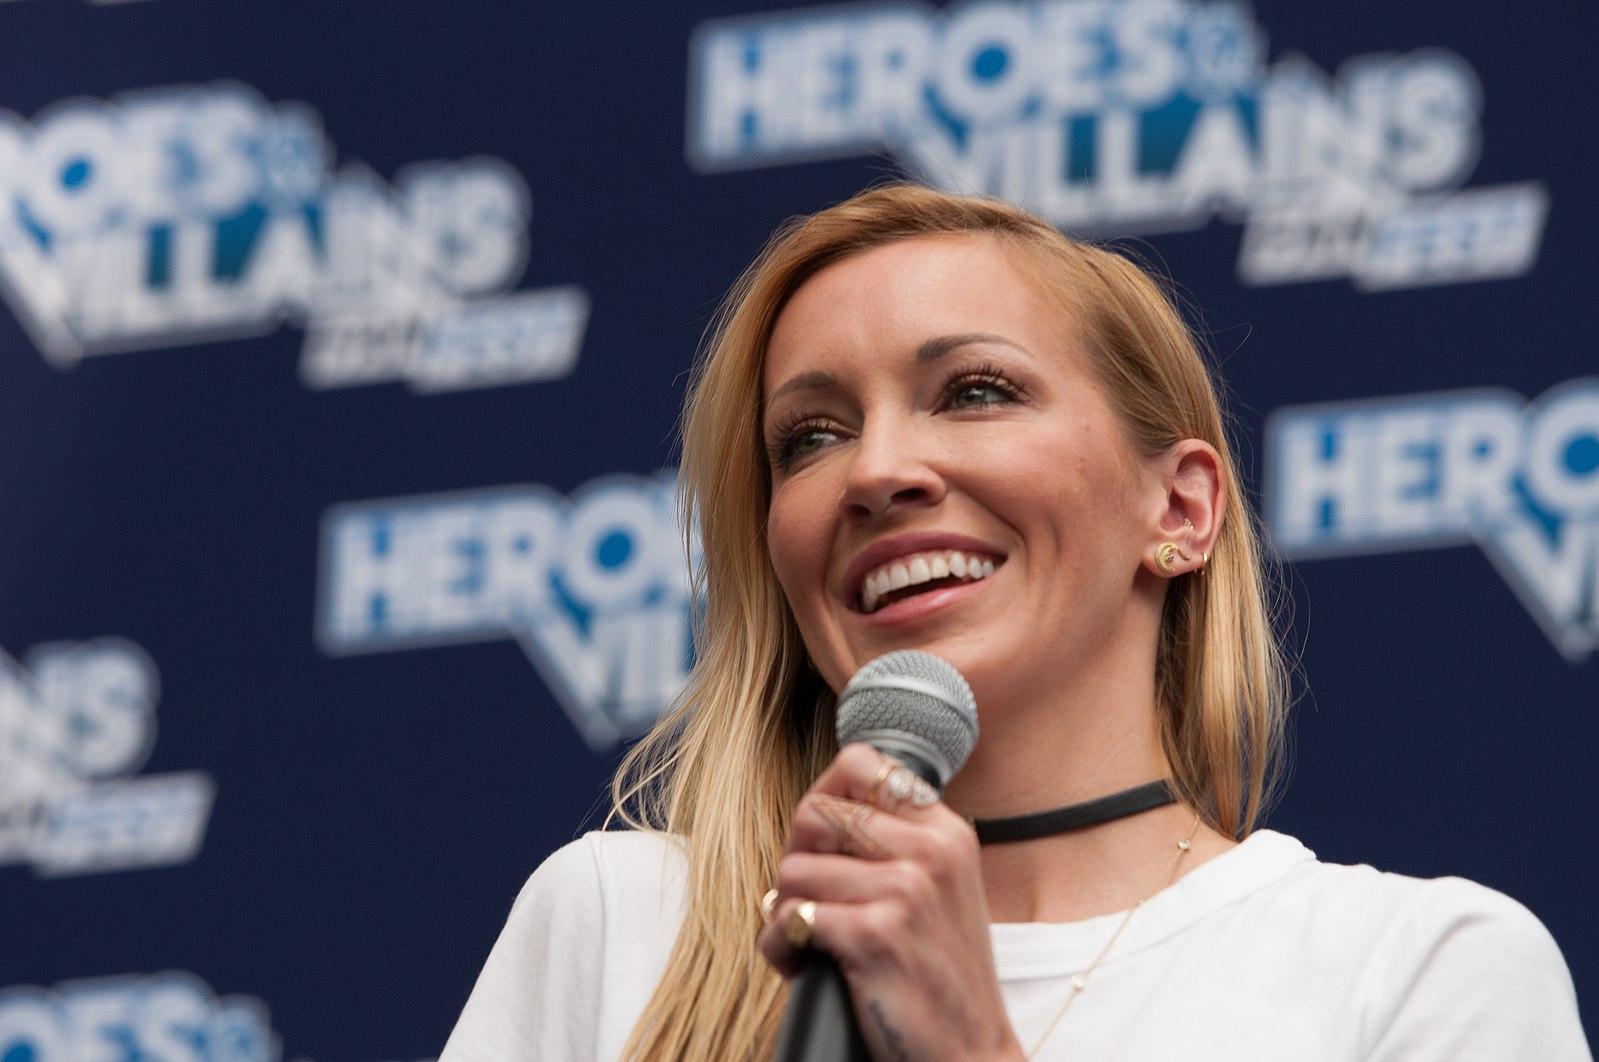 Katie Cassidy at a Fan Fest in London talking about Laurel Lance